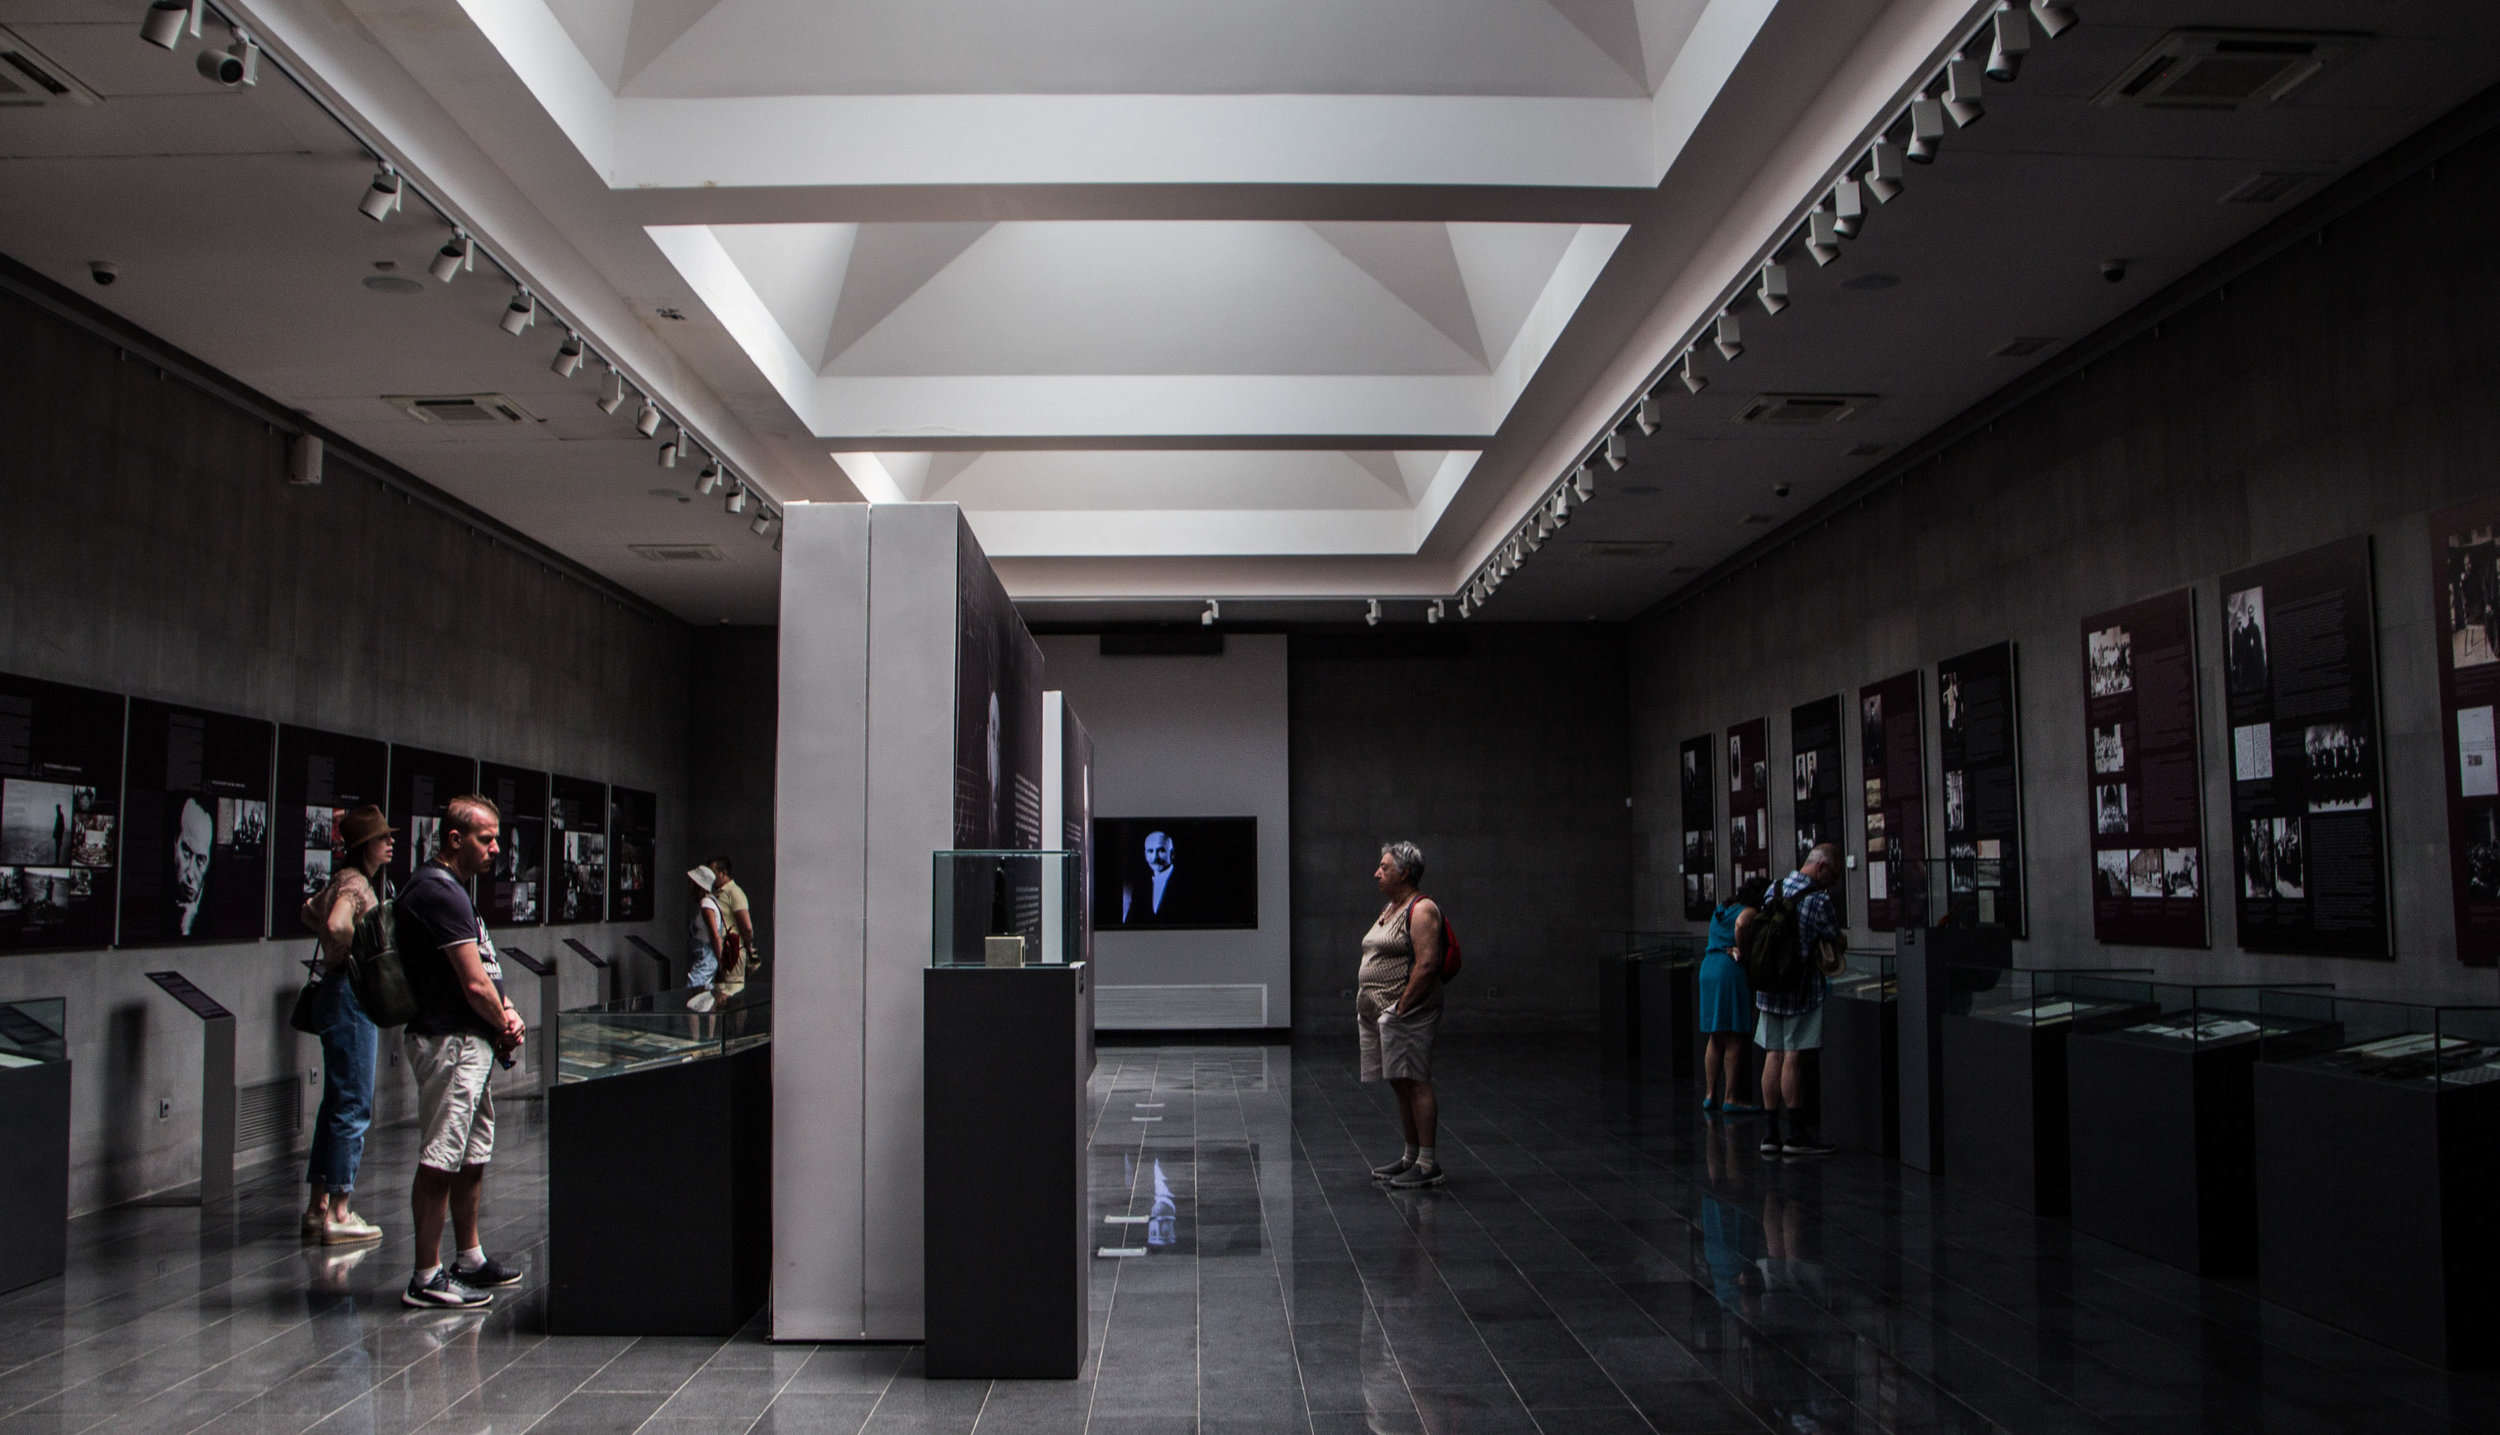 tsitsernakaberd-armenian-genocide-memorial-18.jpg